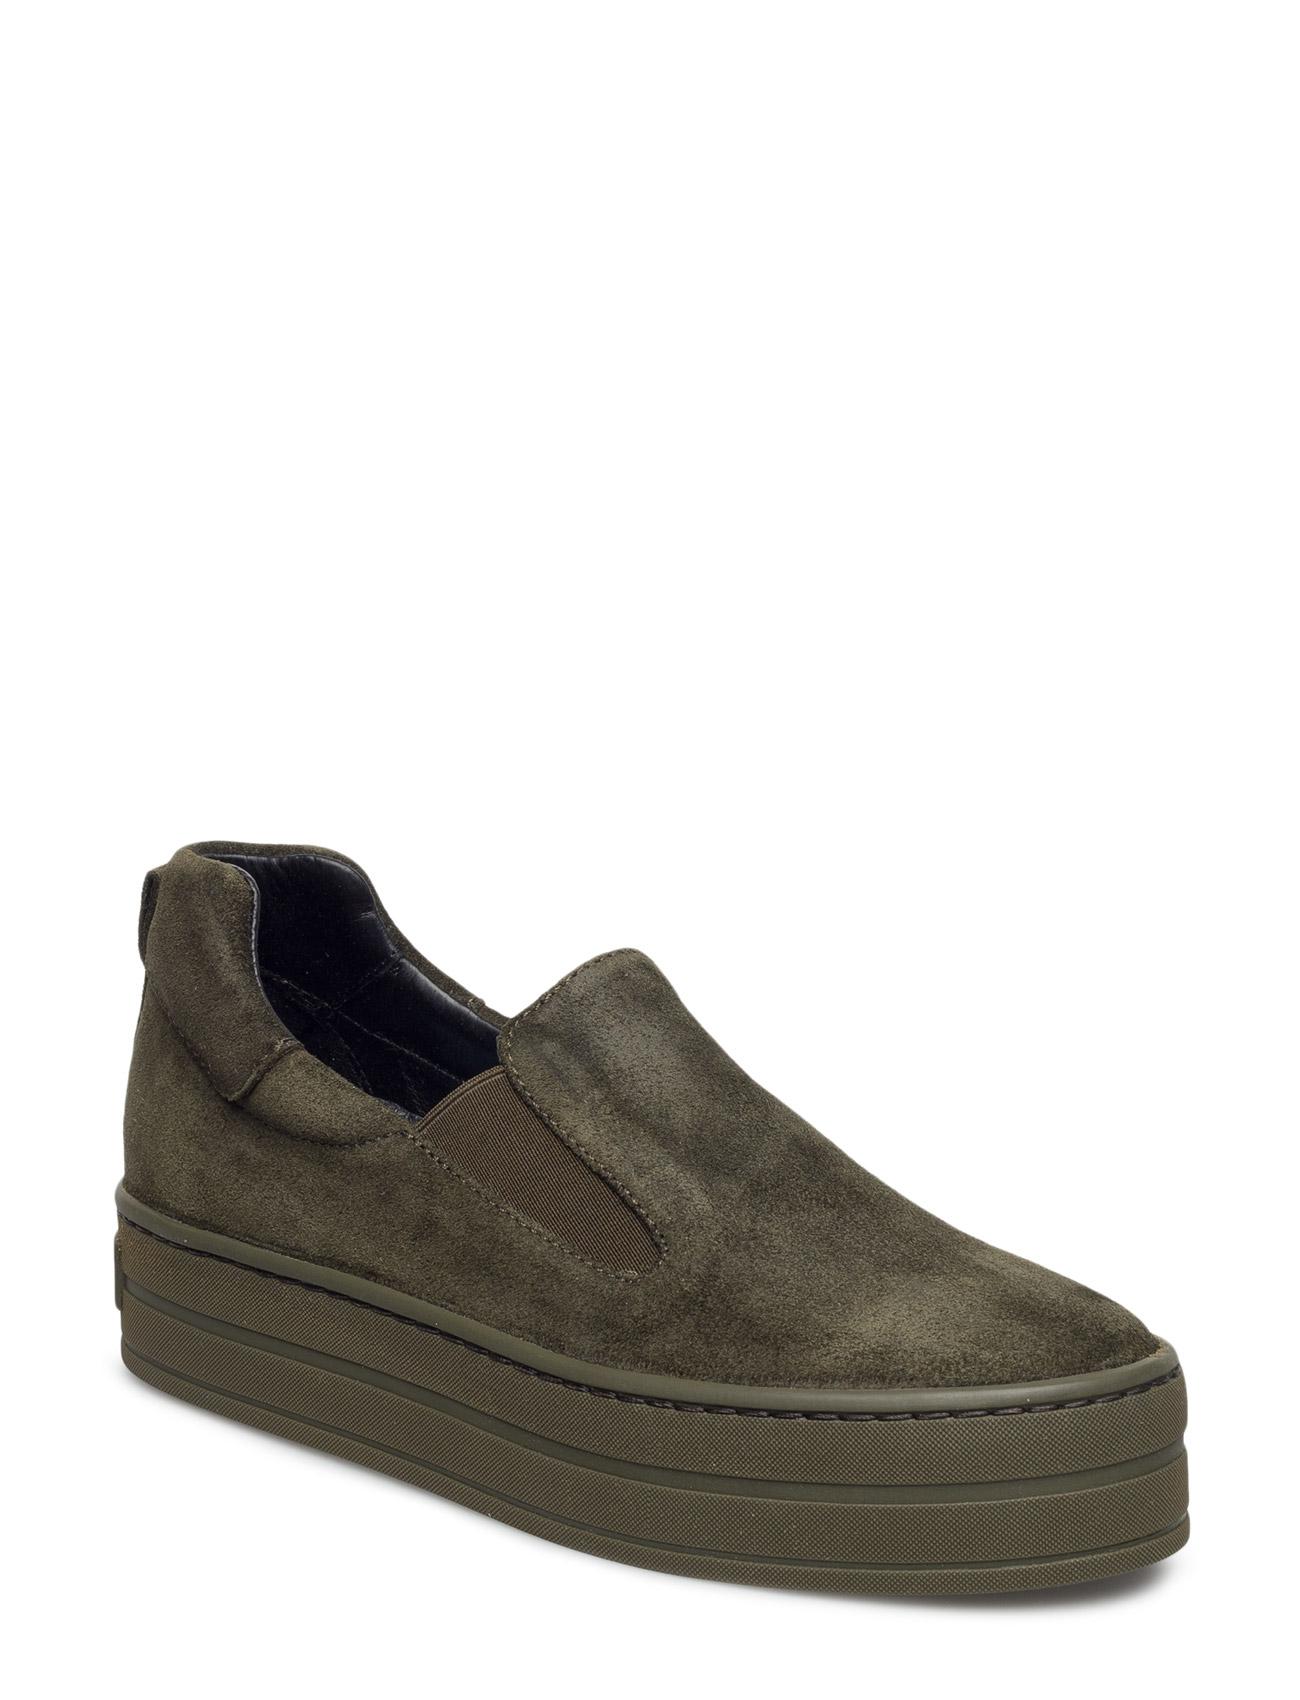 Budrio Apair Sneakers til Damer i